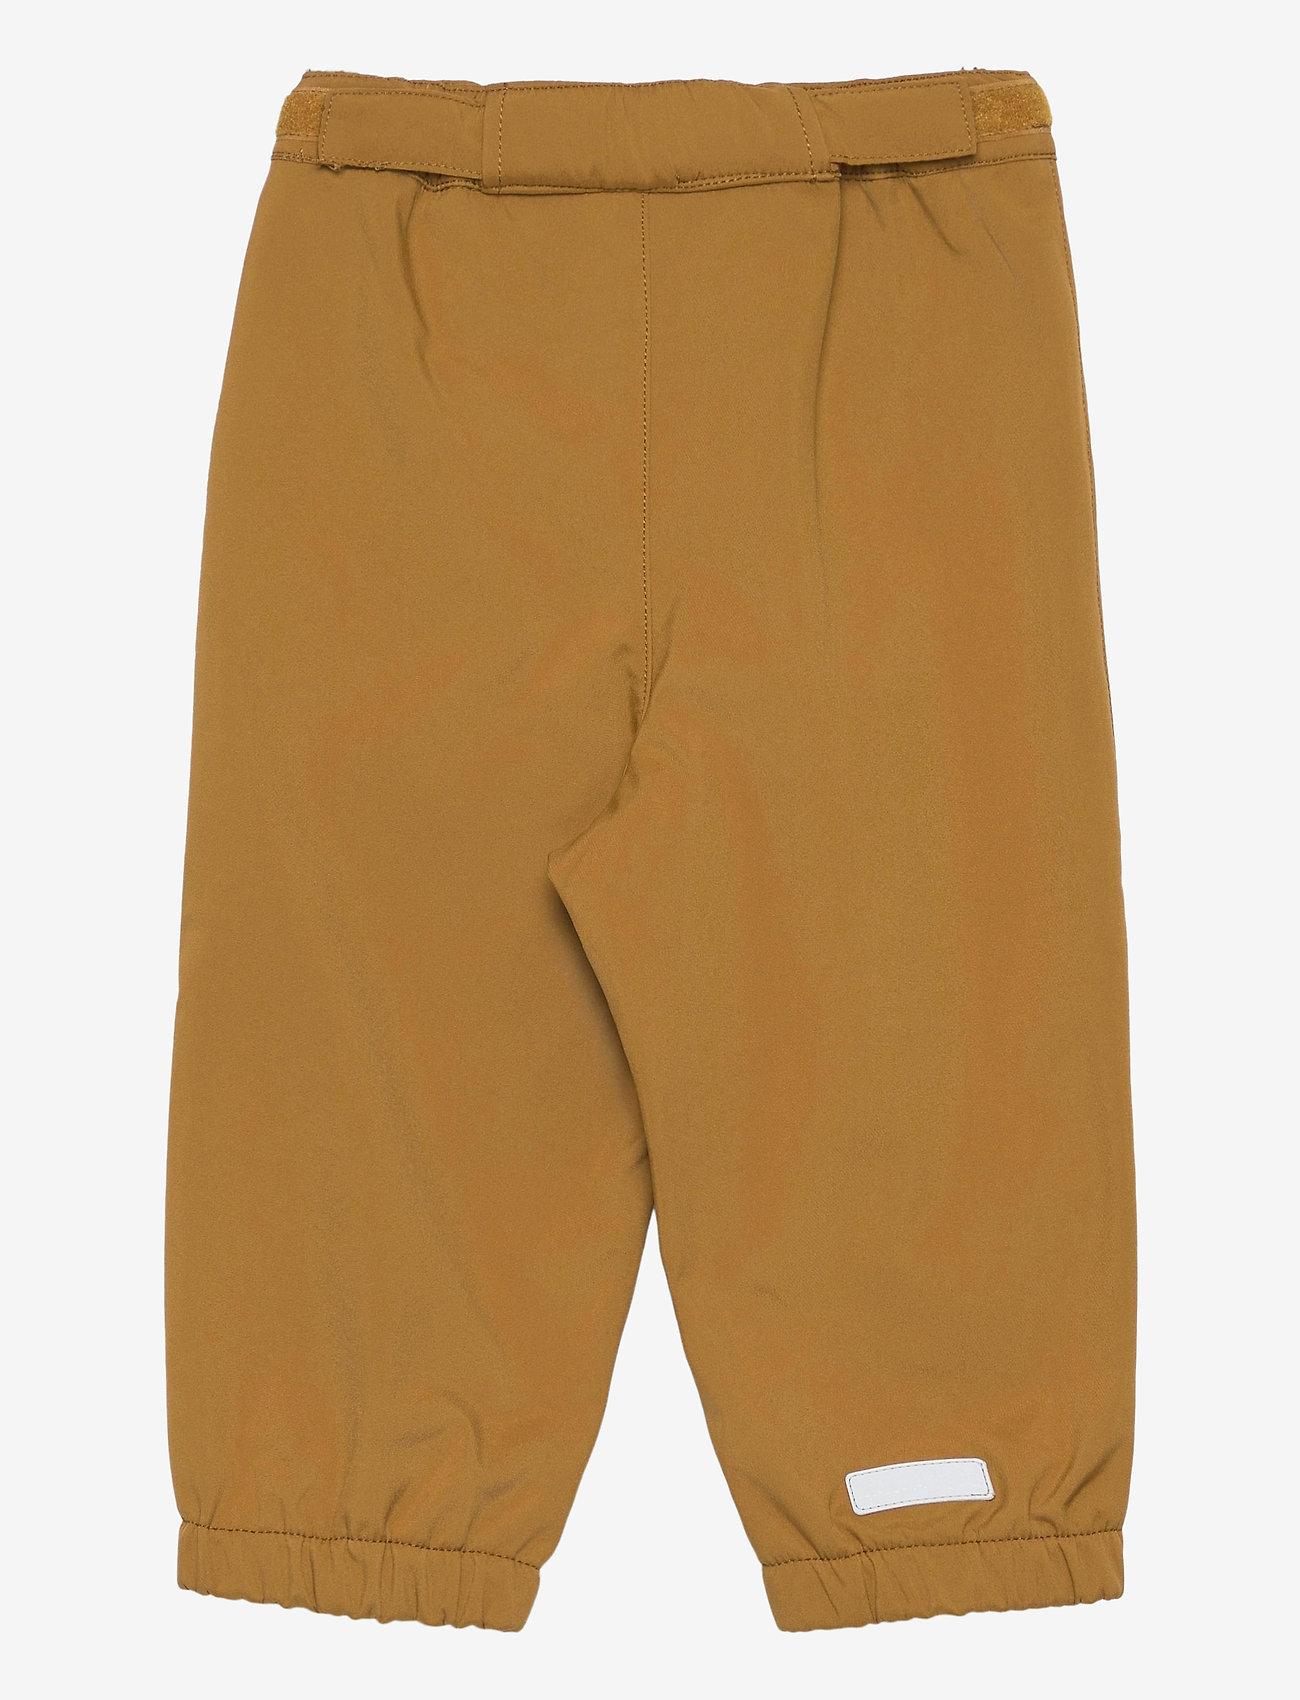 Mini A Ture - Aian Pants, M - bovenkleding - ceylon cinnamon - 1